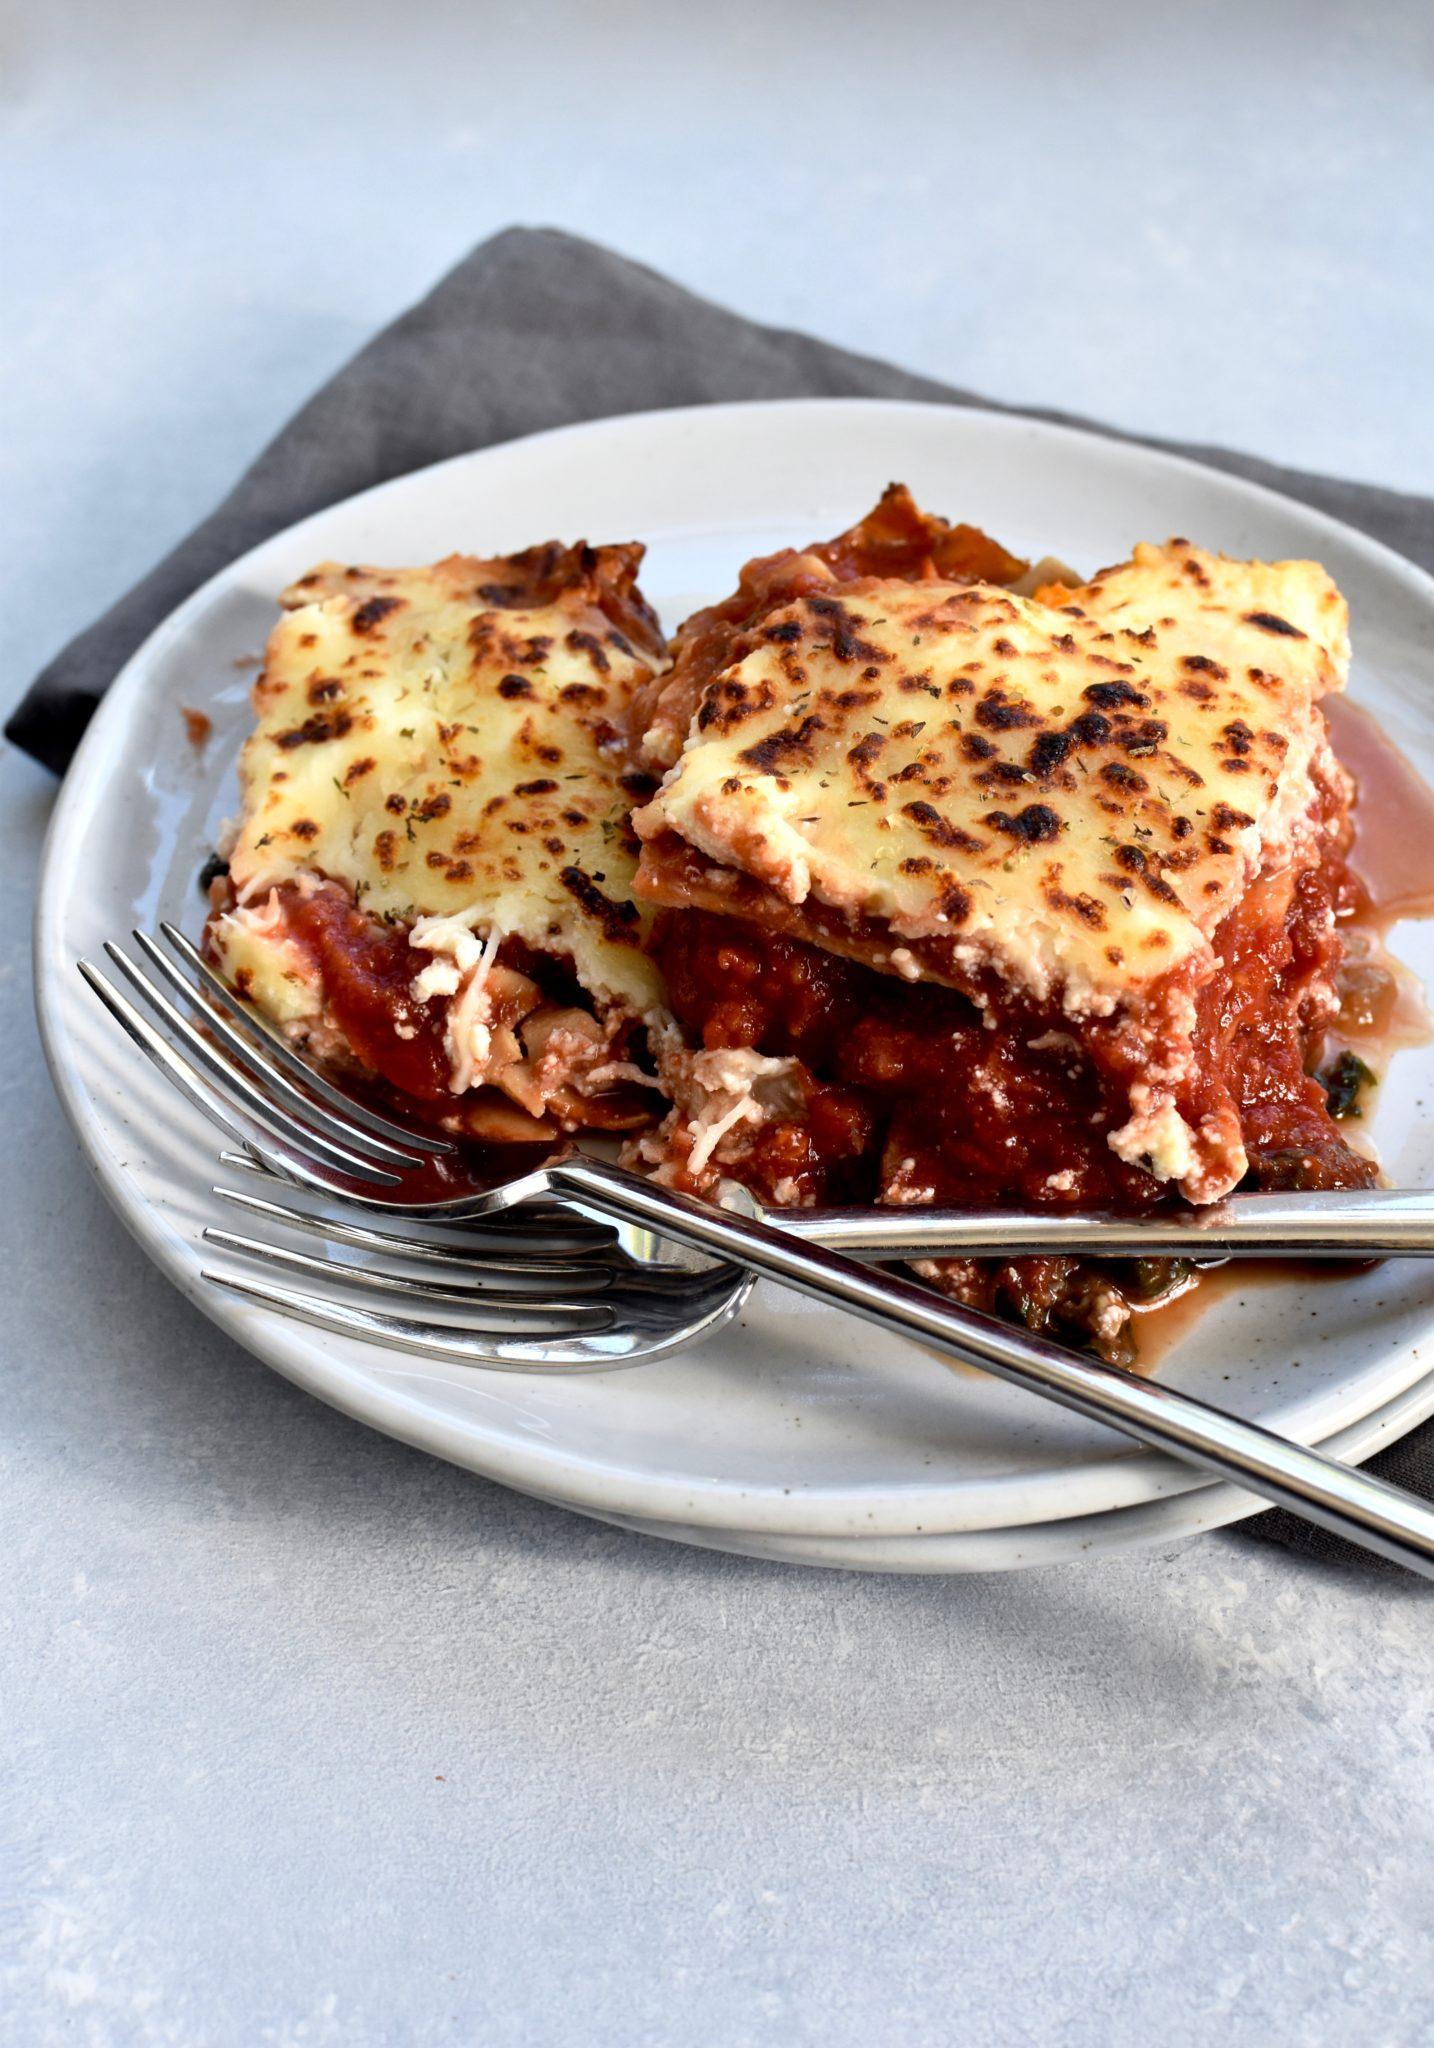 veggie-packed whole grain skillet lasagna // cait's plate